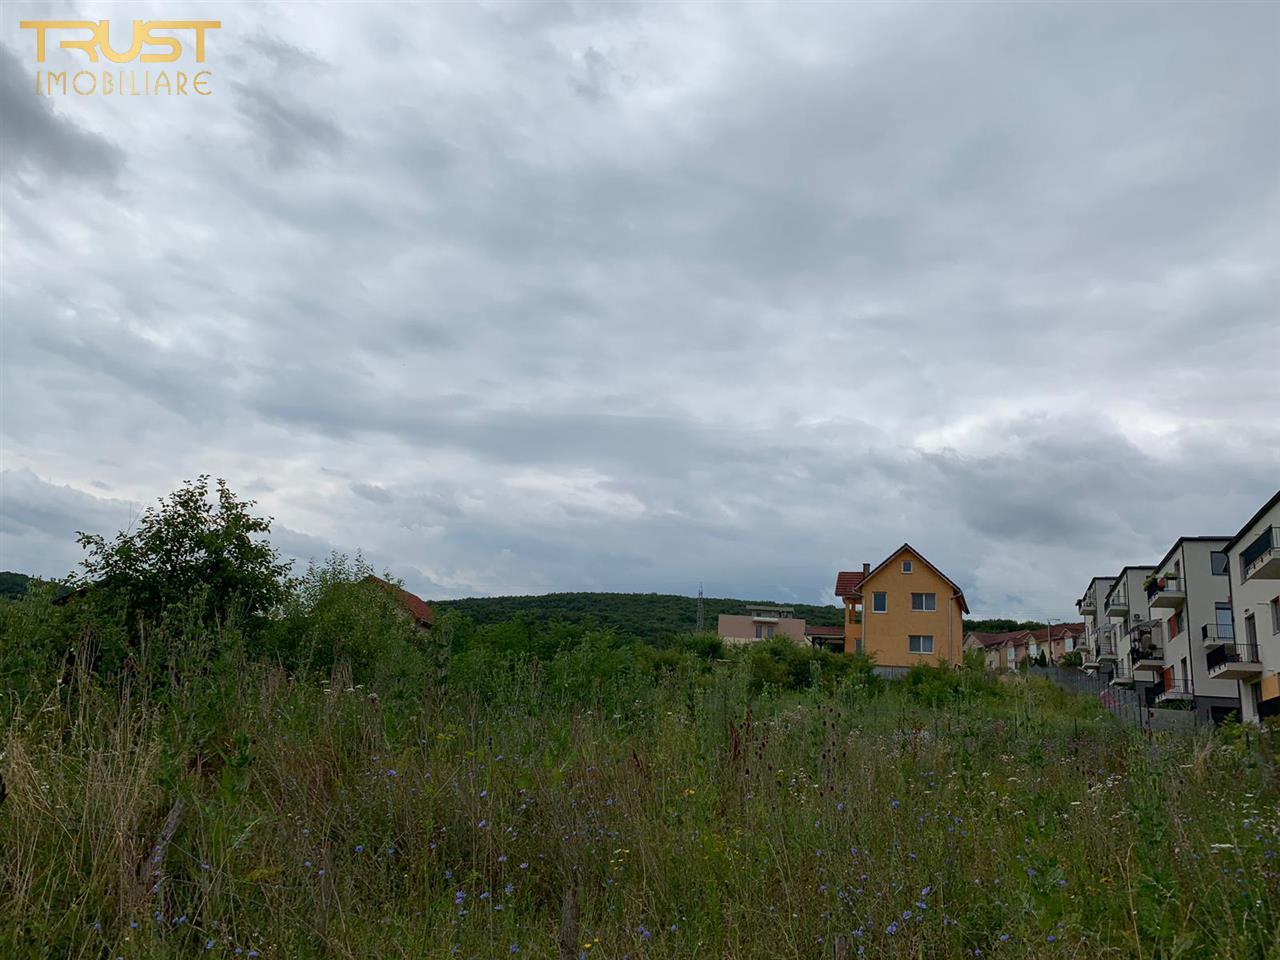 Teren,Str.Campului, 500 mp,utilitati